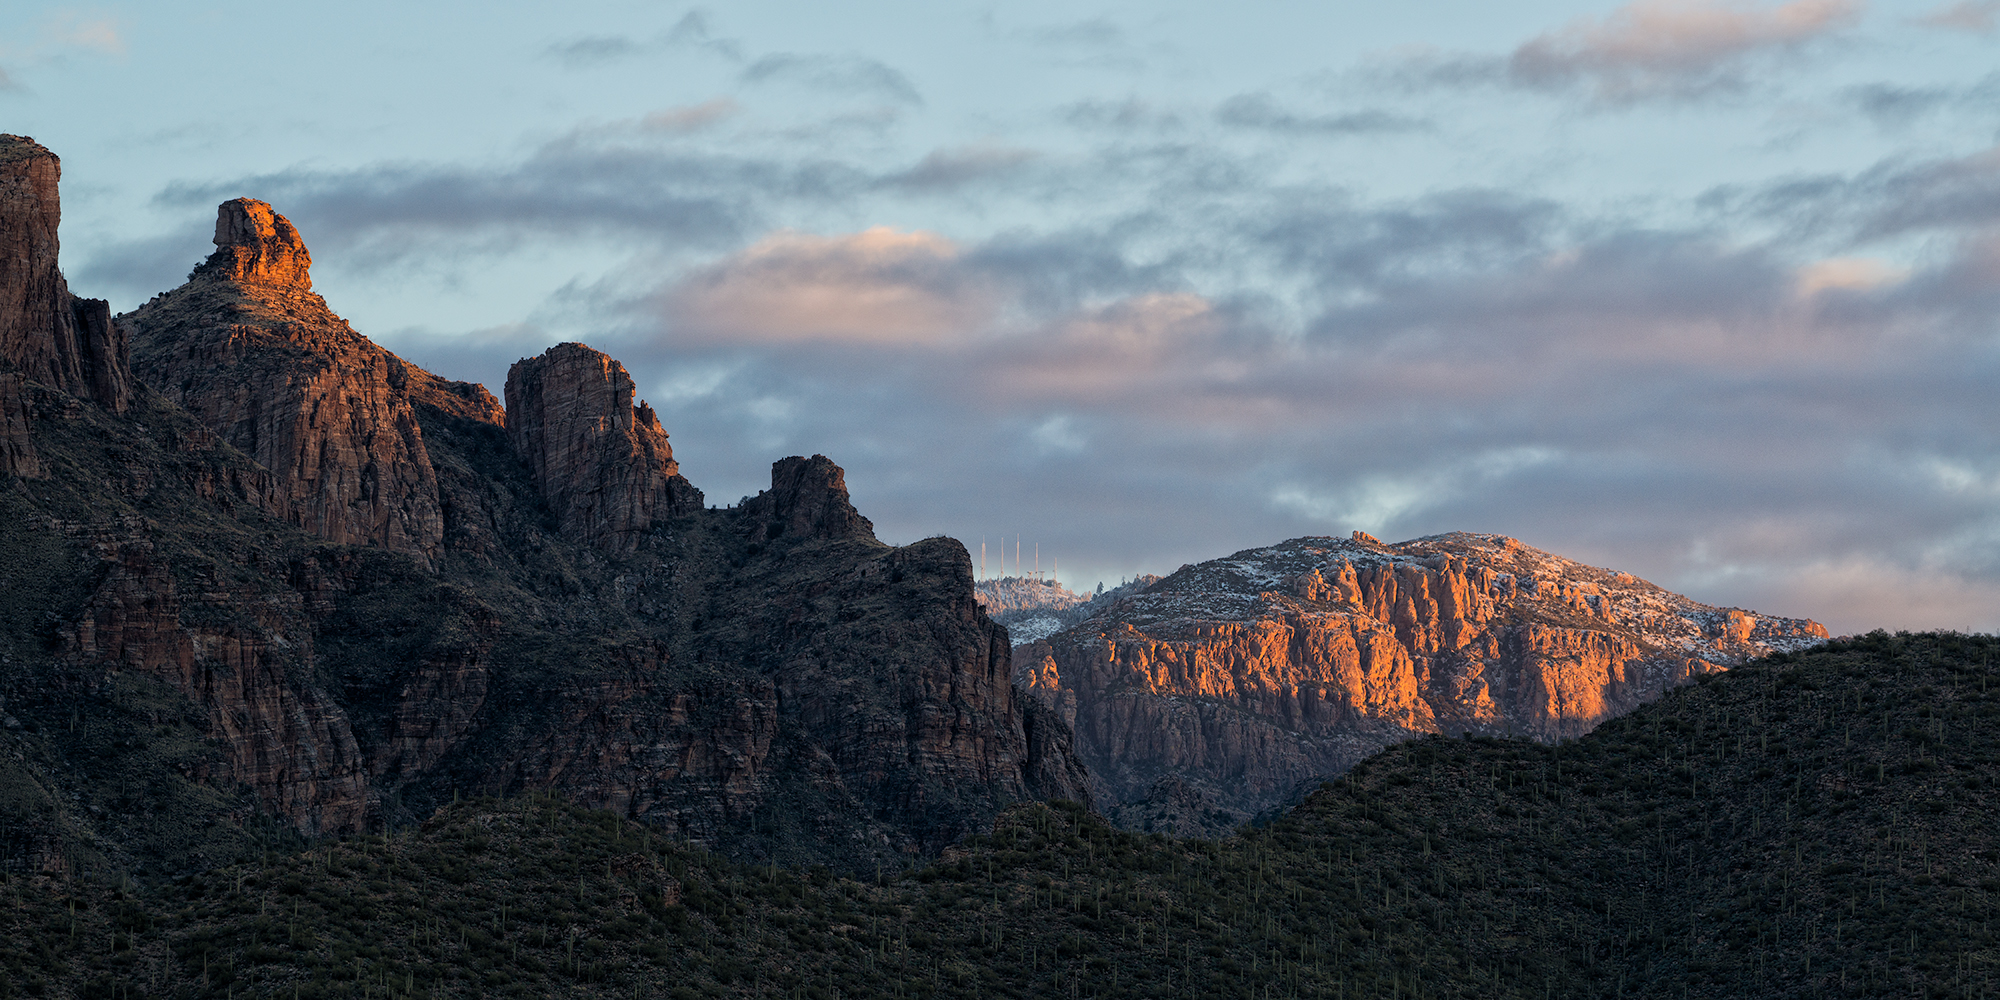 First Light on Thimble Peak. Tucson, Arizona, 2017